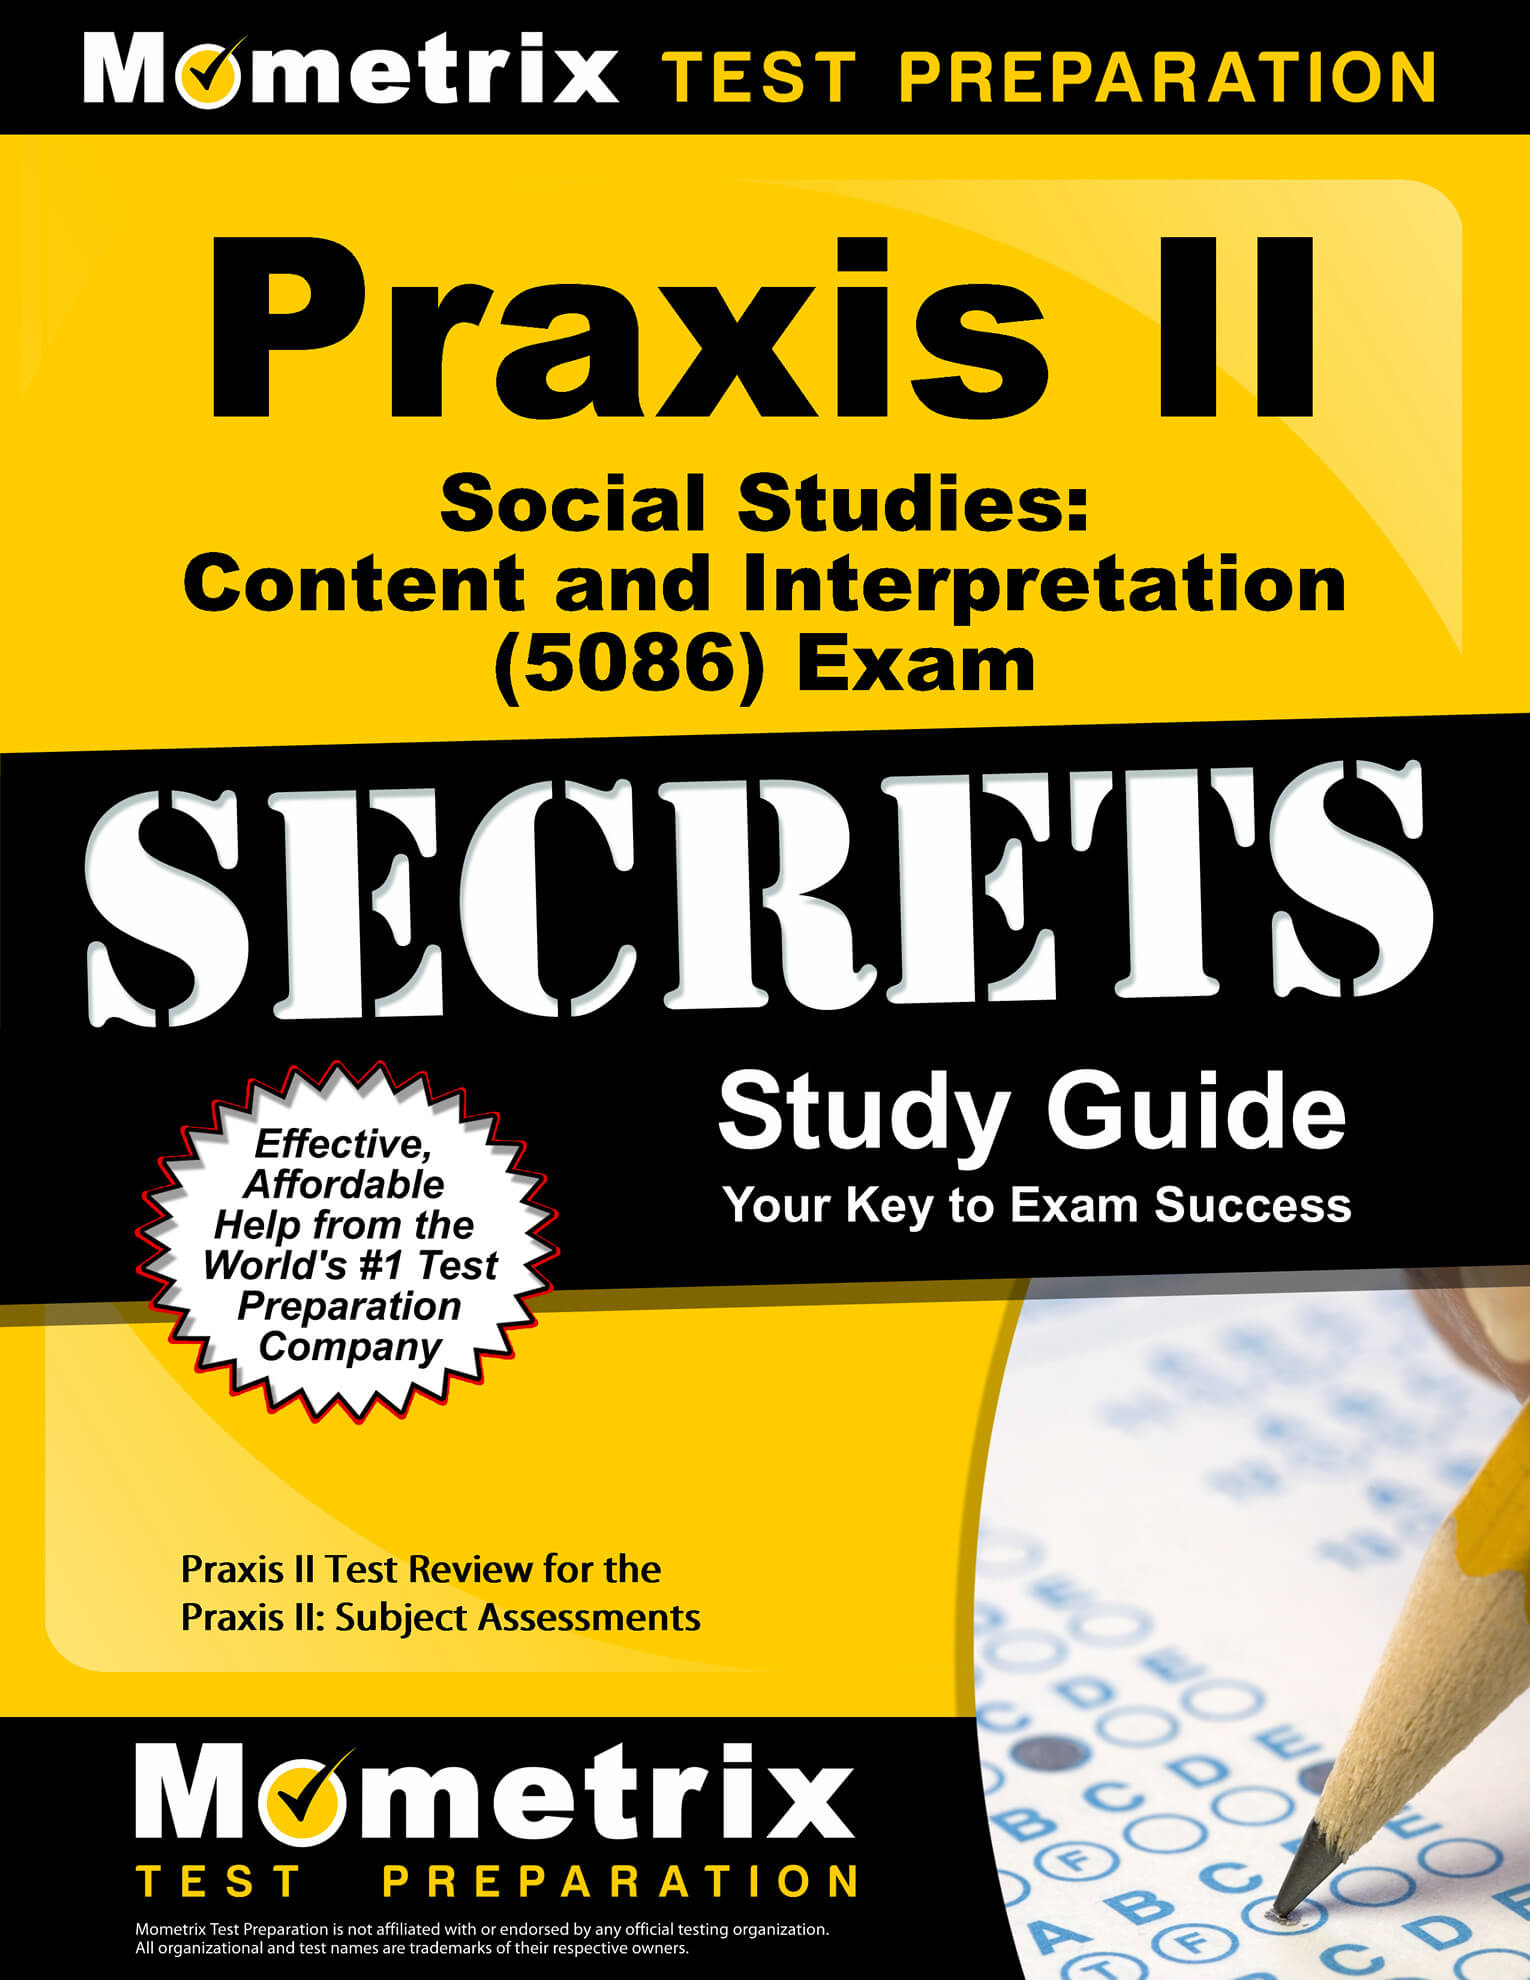 praxis ii social studies content practice test rh mometrix com Praxis II Math praxis 2 study guide 5086